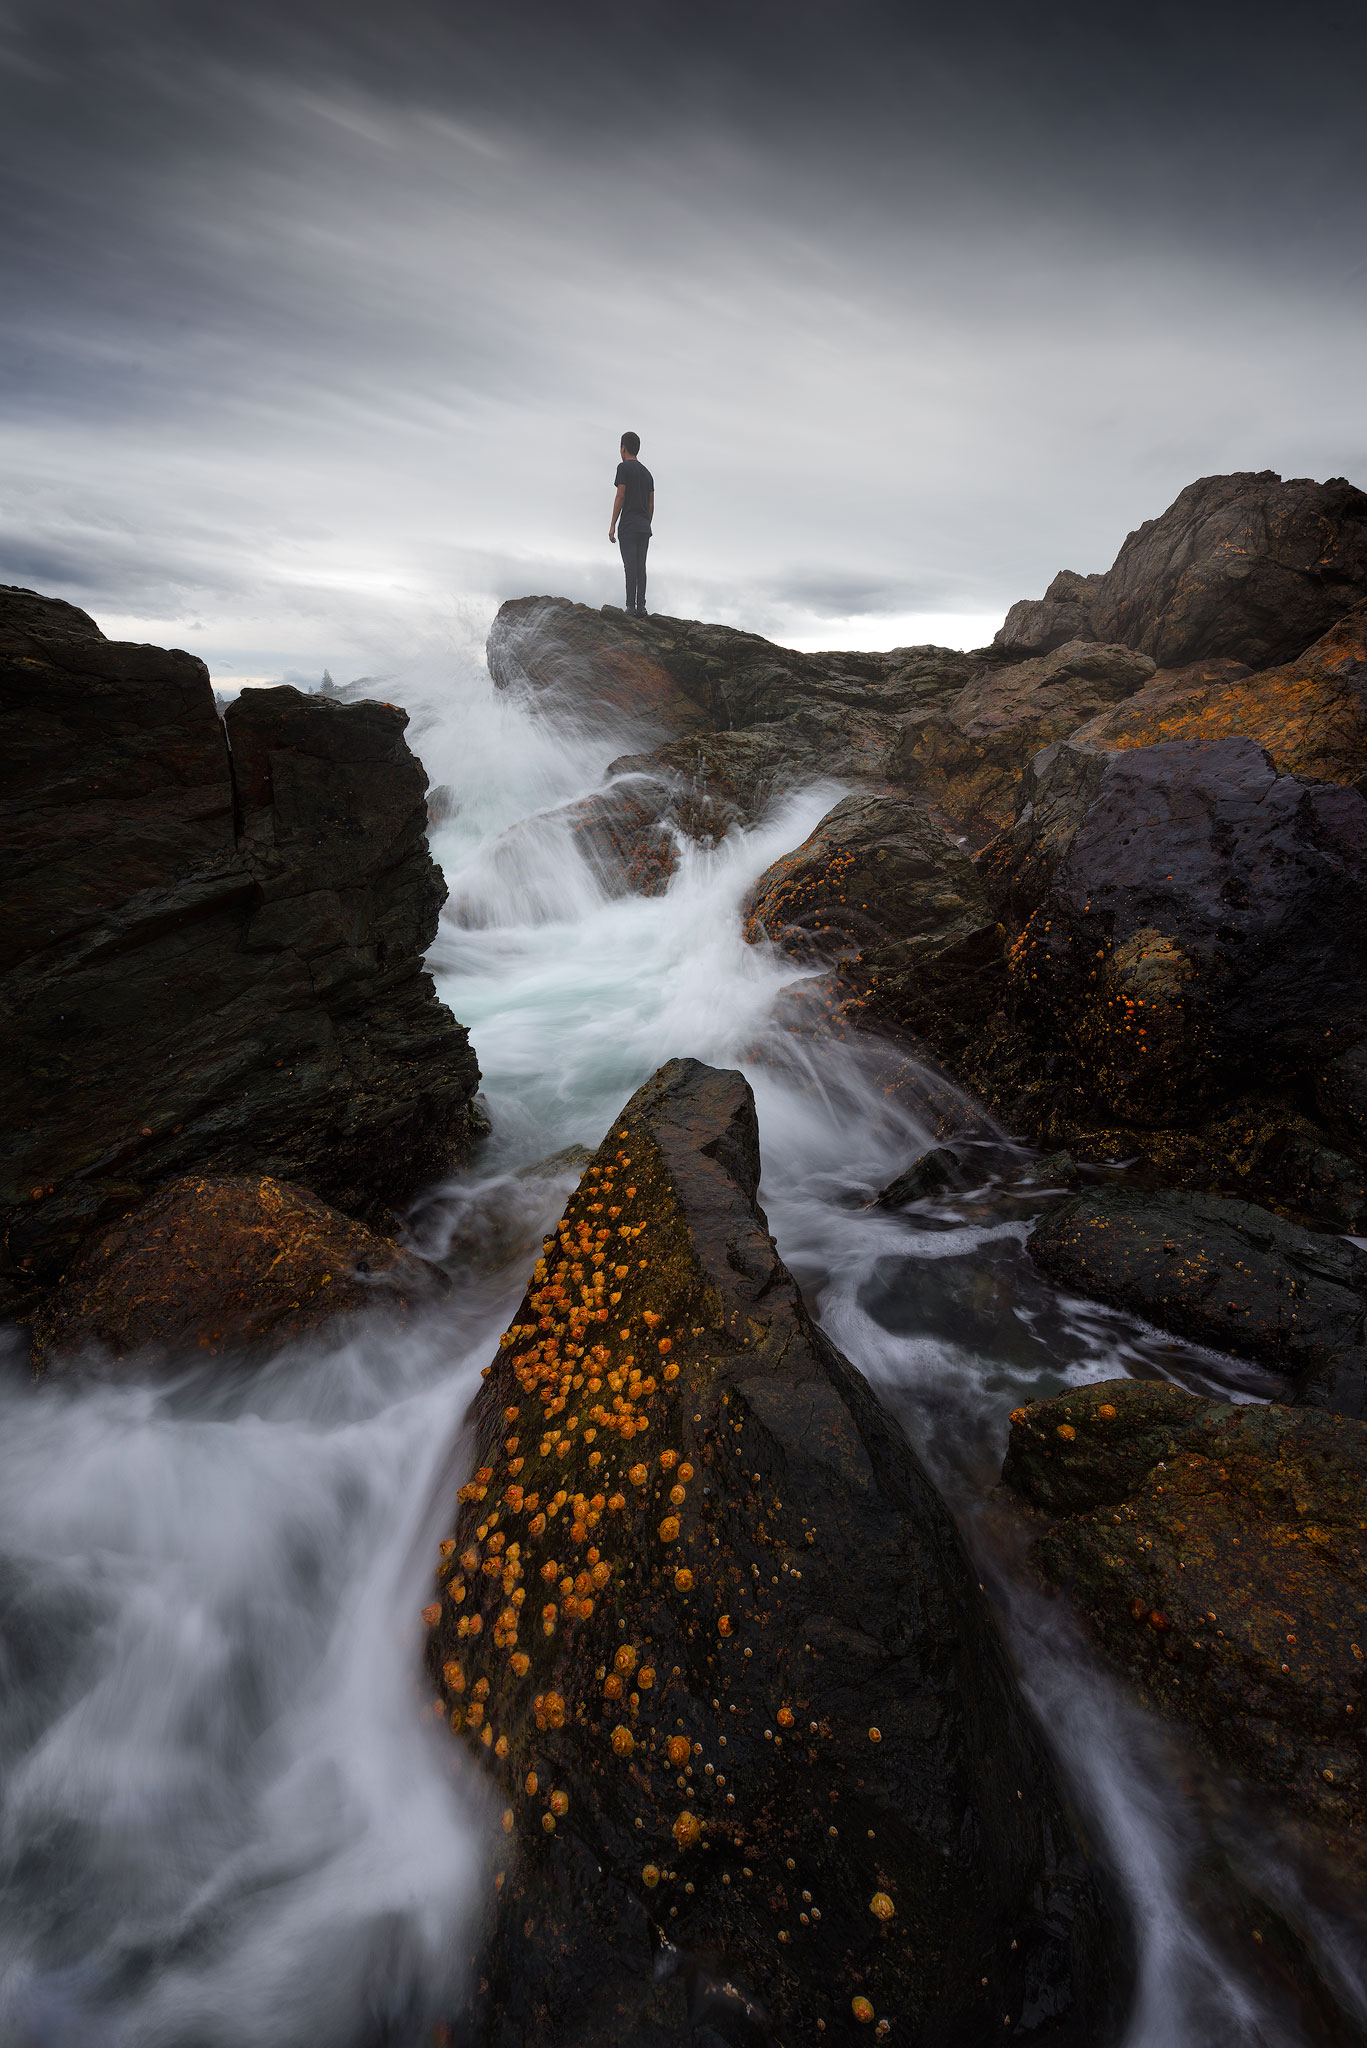 lighthousebeach_3stop.jpg